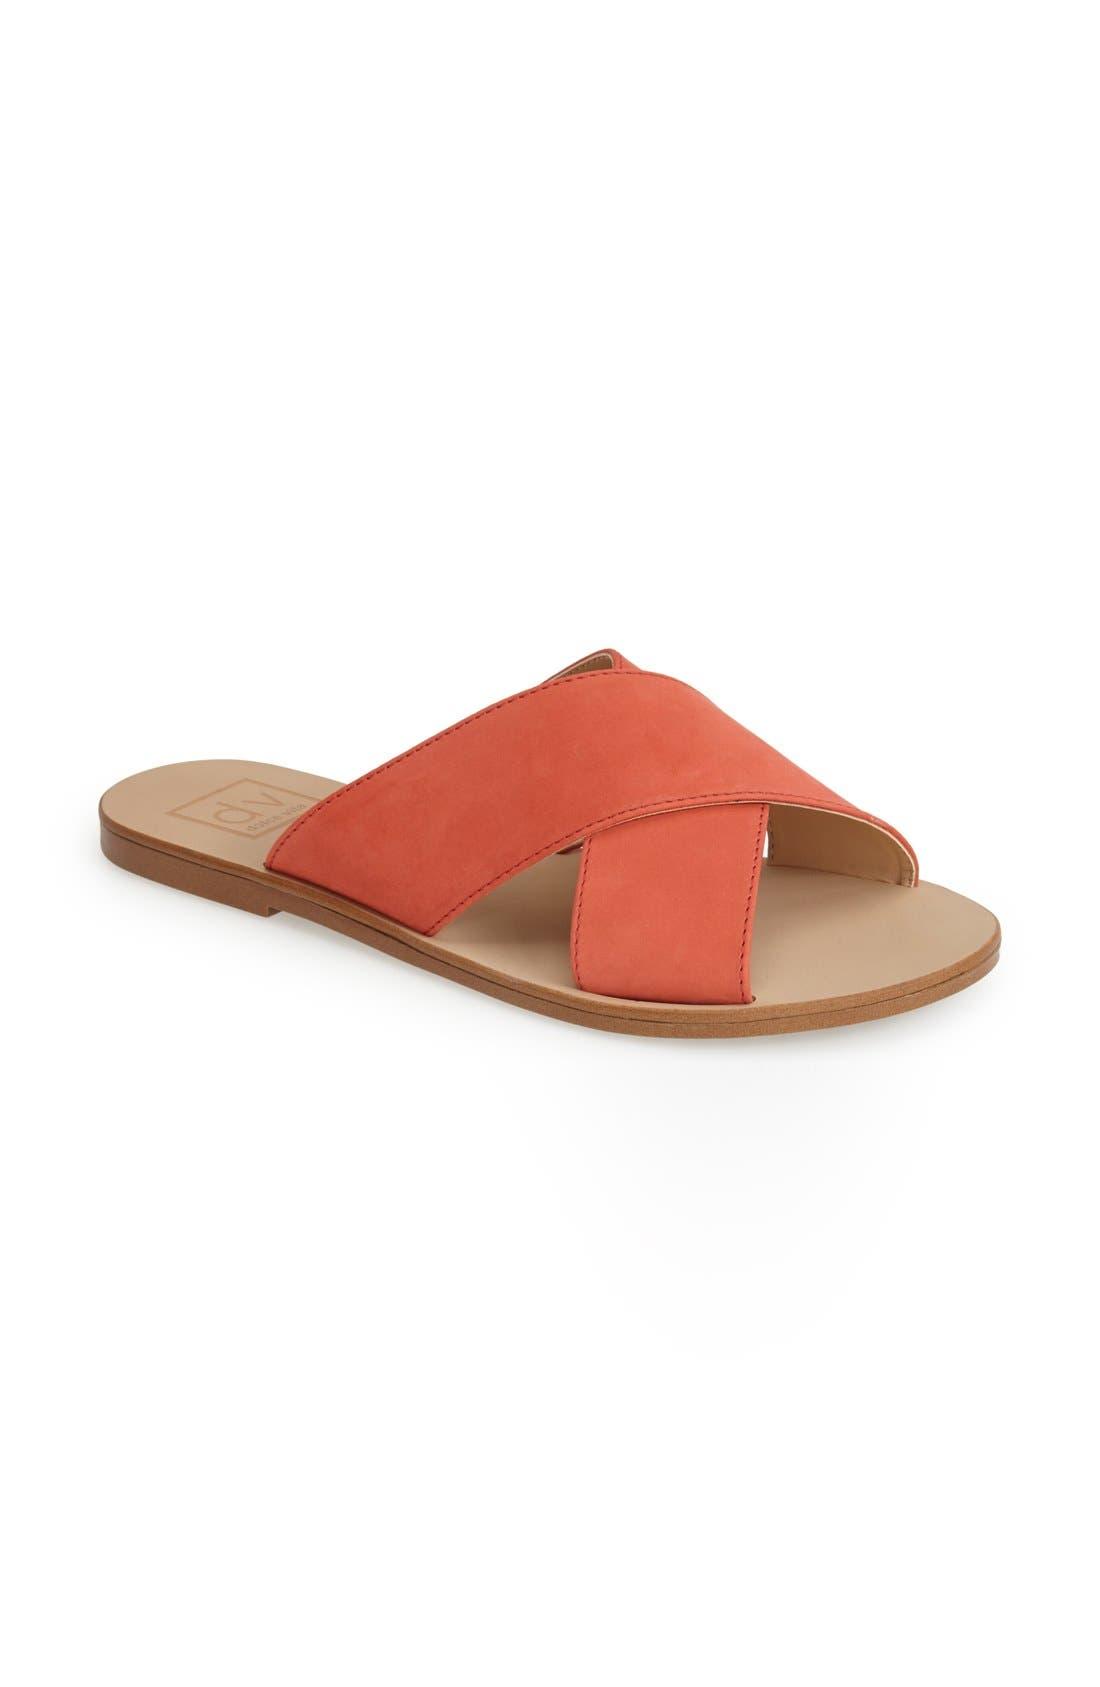 Main Image - DV by Dolce Vita 'Orra' Crossover Strap Flat Sandal (Women)